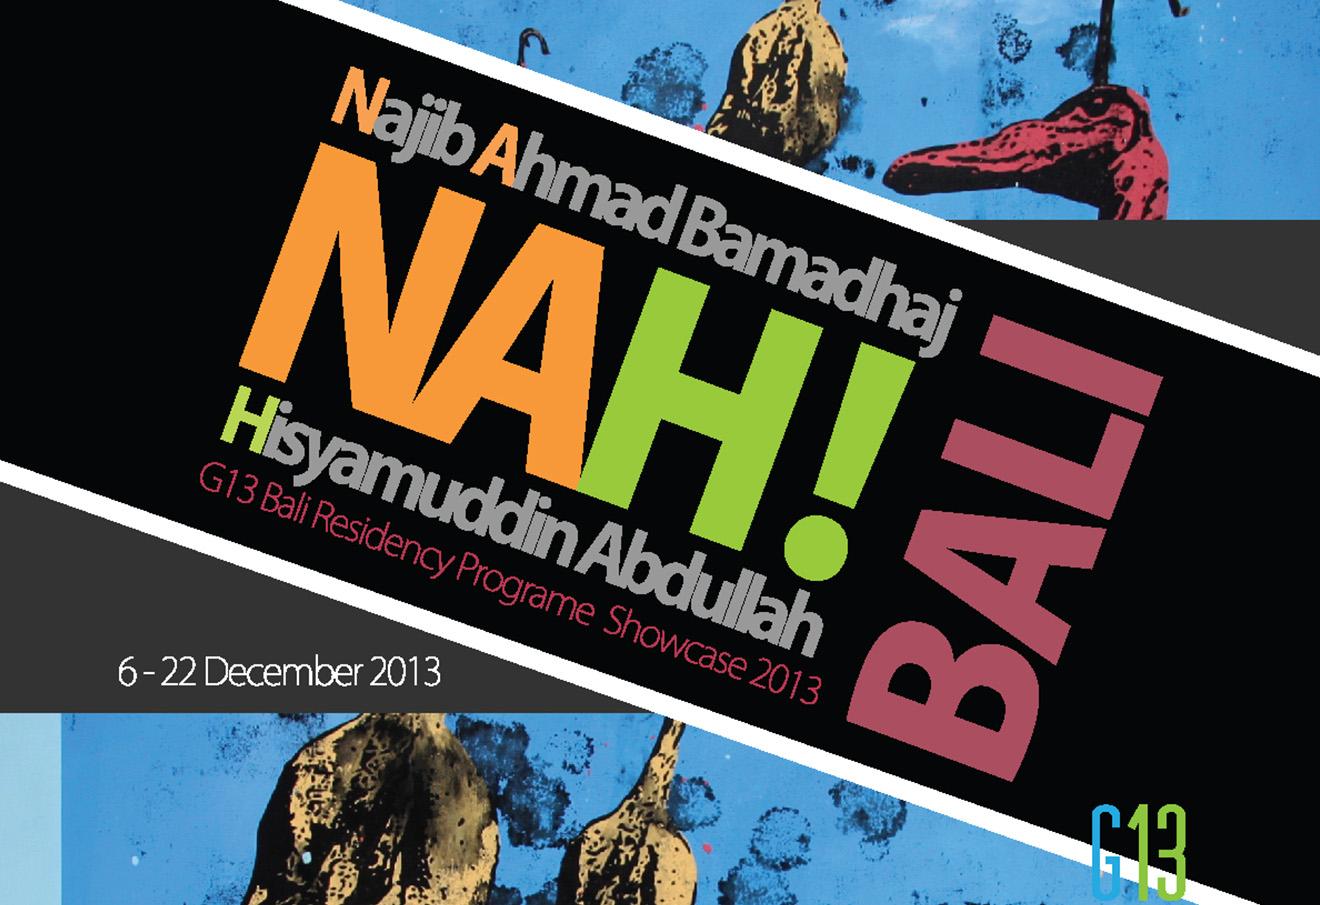 NAH! Bali